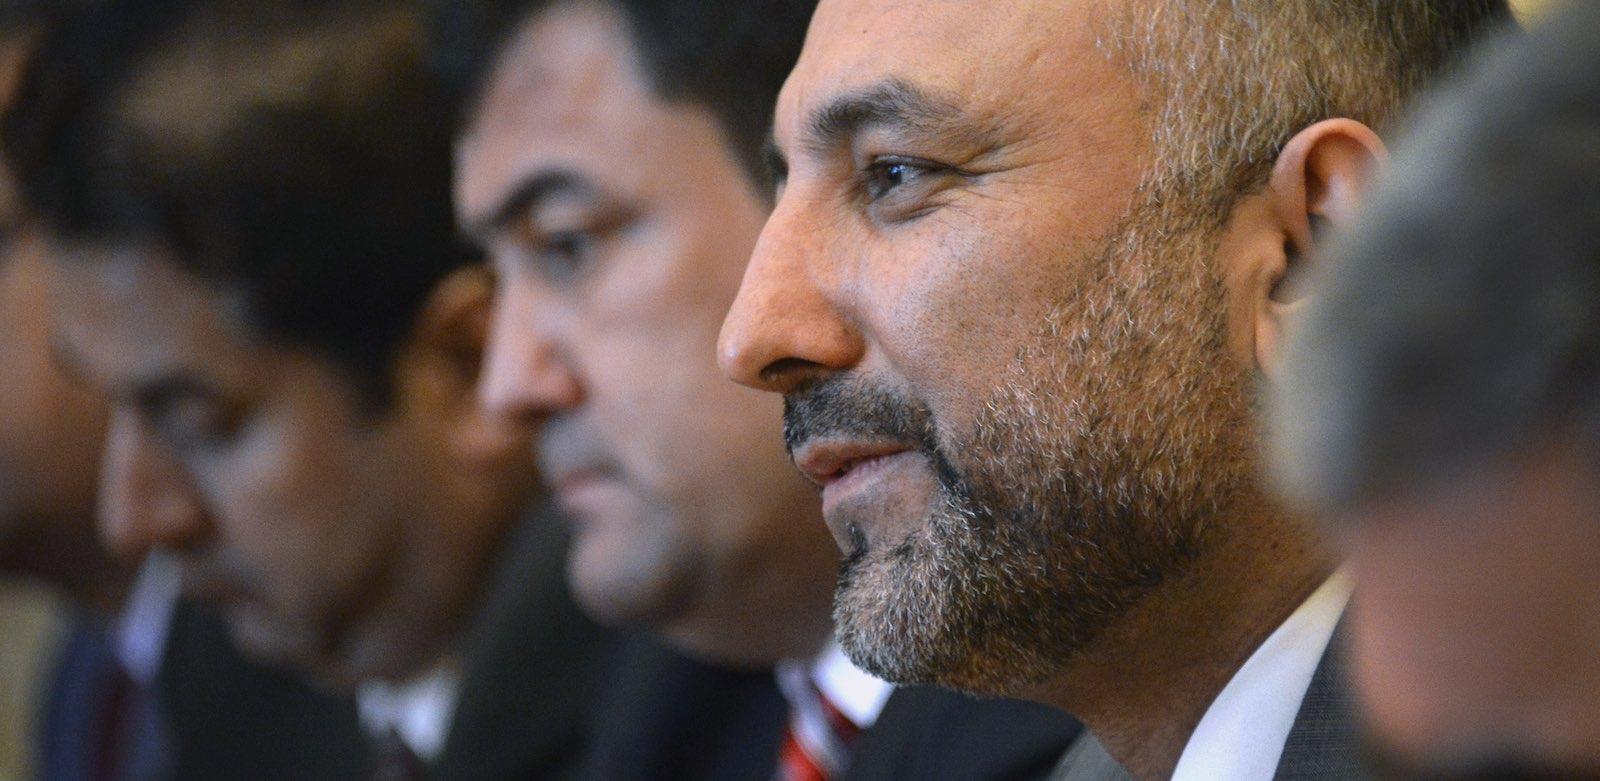 Hanif Atmar, former Afghan National Security Advisor, will run for president (Photo: Alexander Nemenov via Getty)